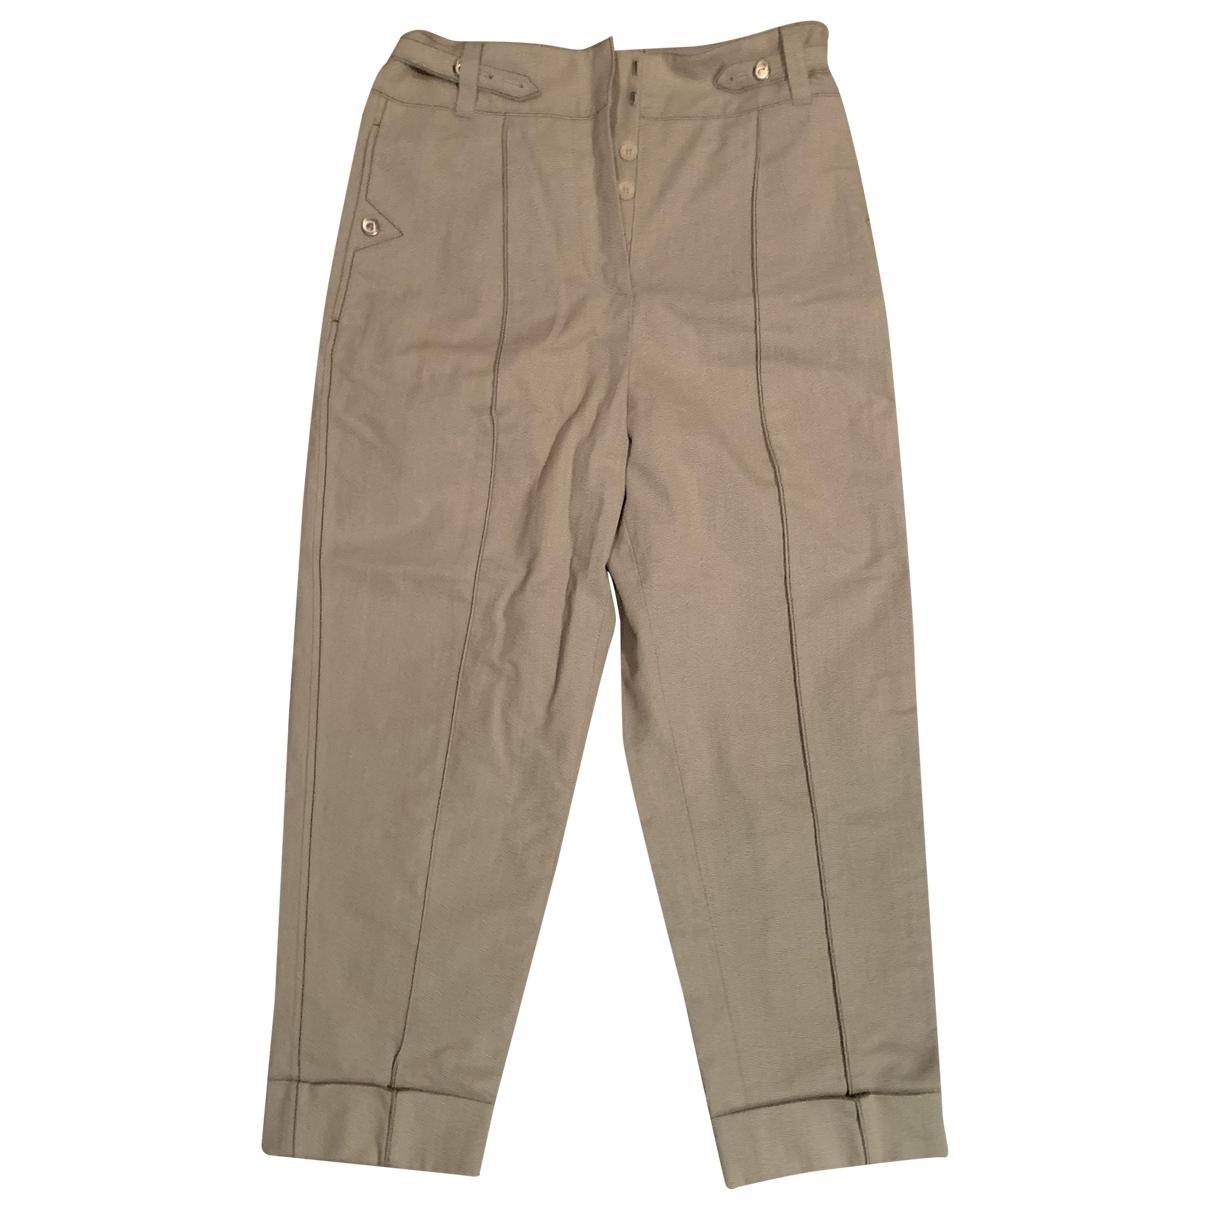 Bottega Veneta \N Camel Cotton Trousers for Women 38 IT